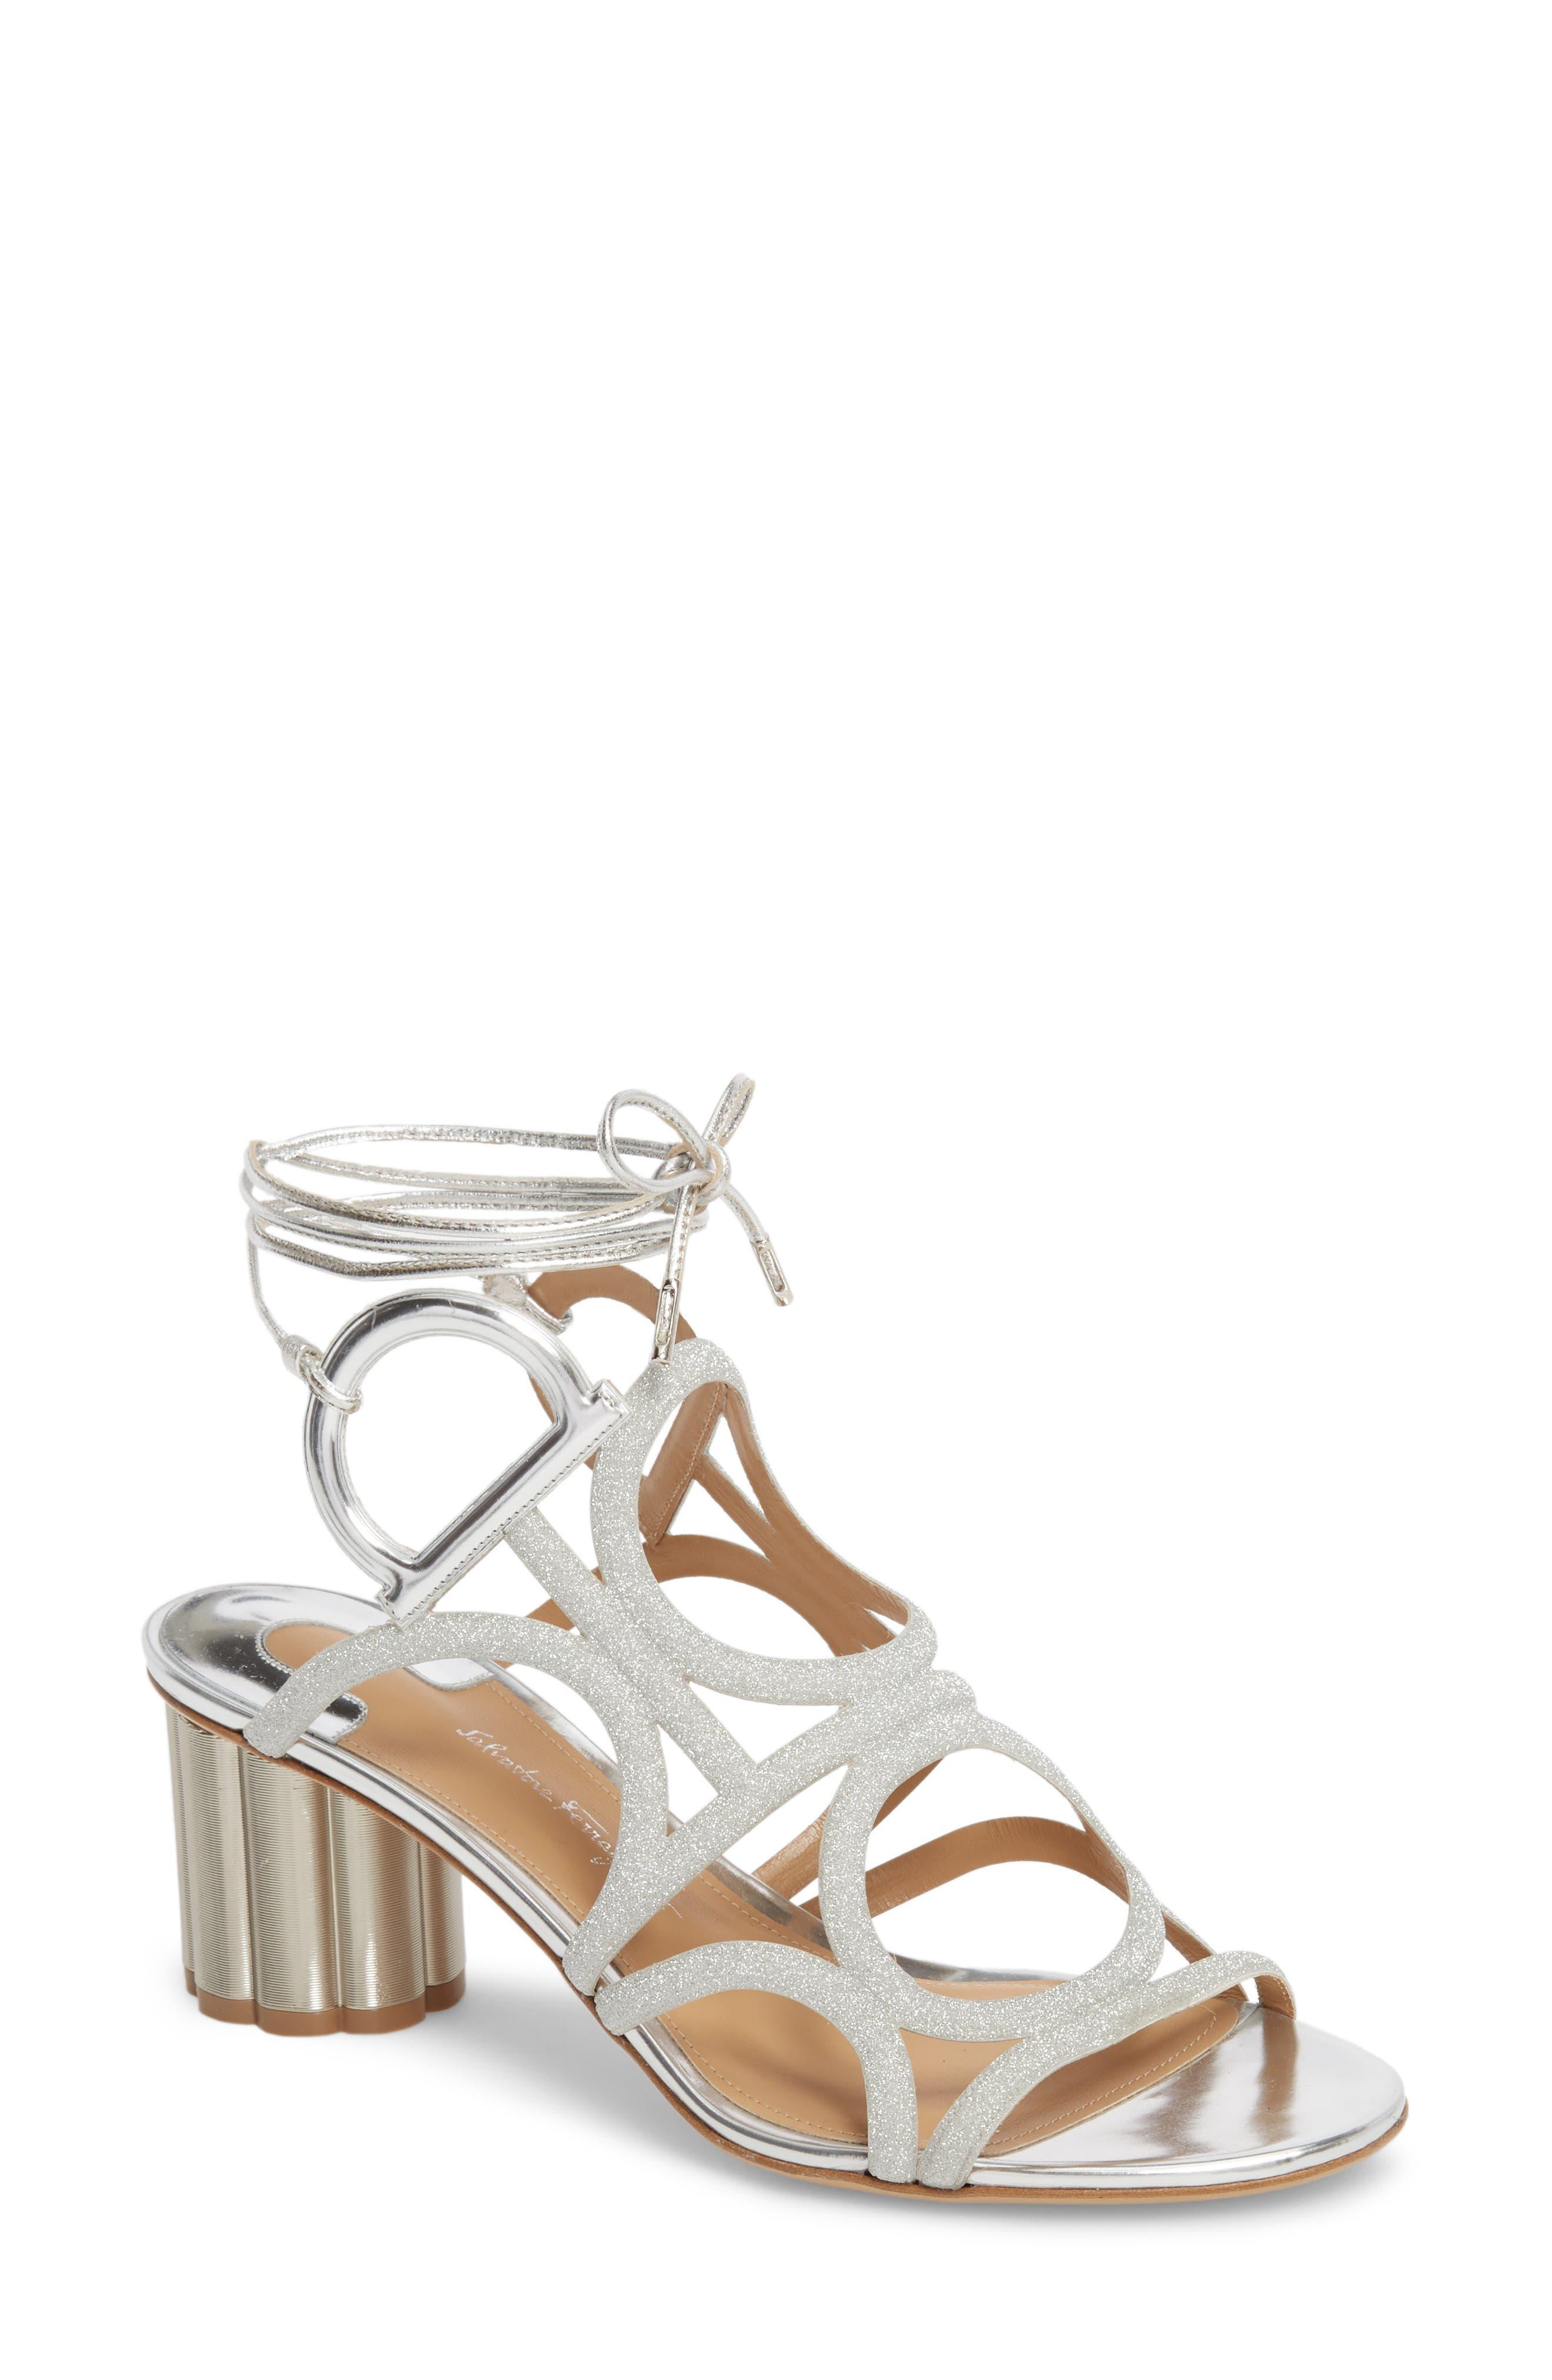 Alternate Image 1 Selected - Salvatore Ferragamo Vinci Lace-Up Sandal (Women)